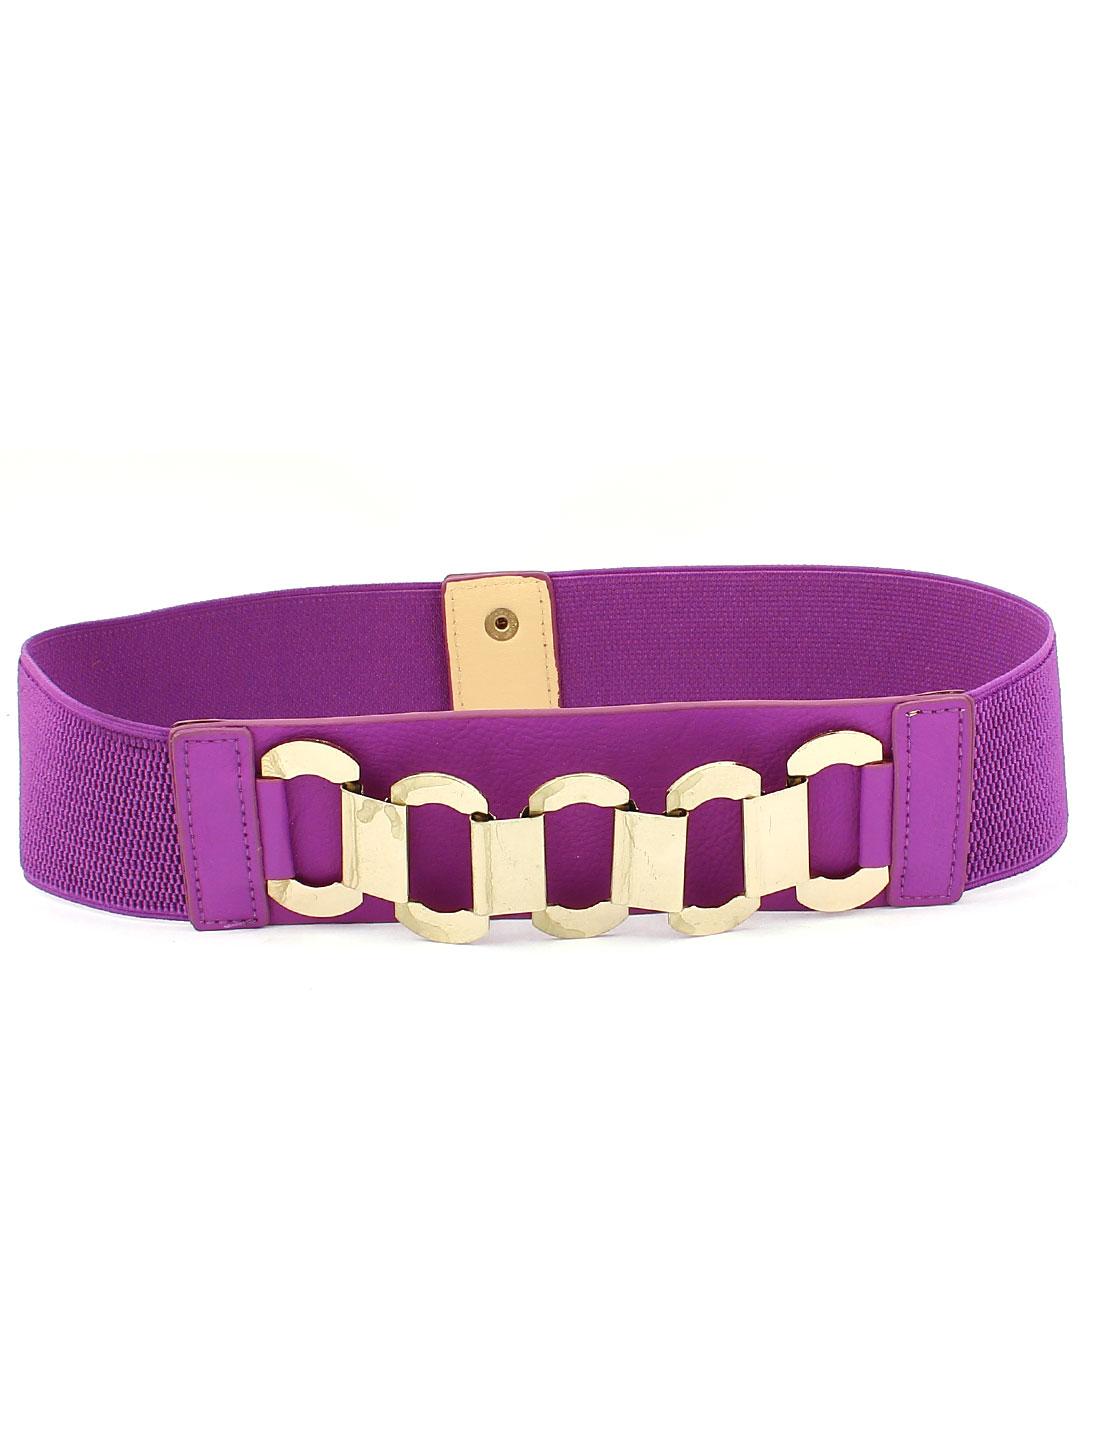 Lady Dress Interlock Buckle Wide Elastic Waist Belt Waistband Purple